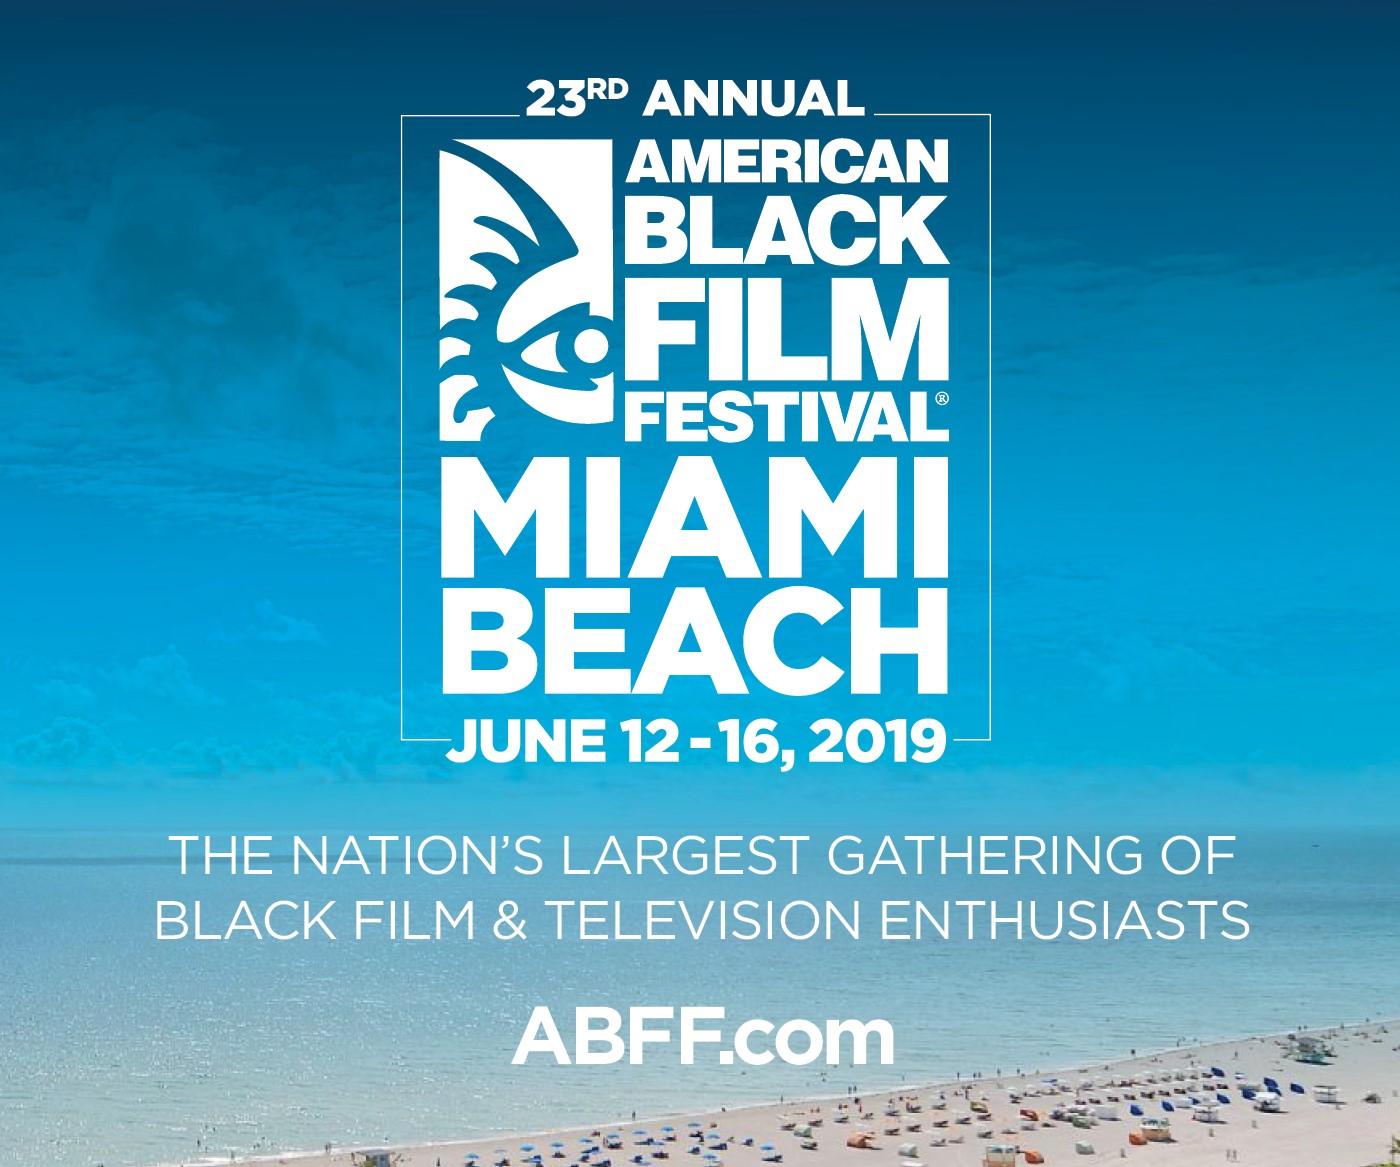 American Black Film Festival Flyaway Contest